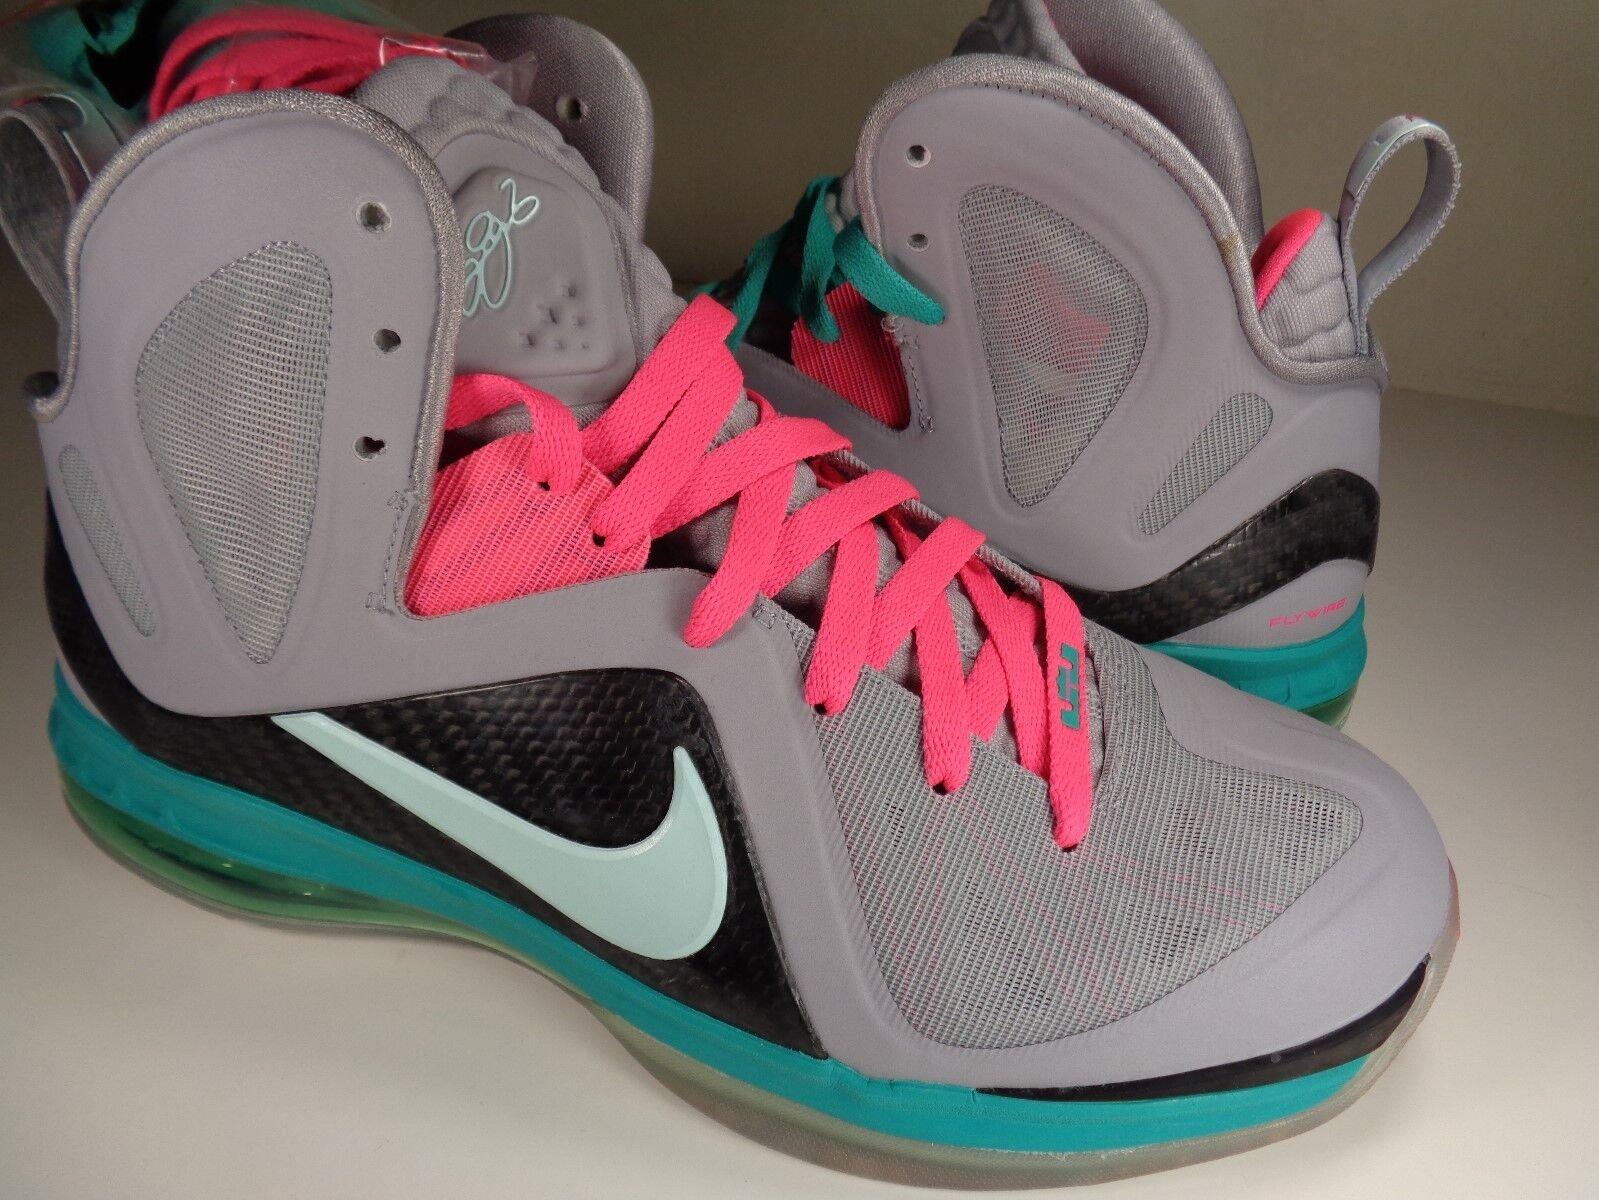 Nike Lebron 9 PS Elite IX South Beach Wolf Grey Pink Green SZ 9 (516958-001)